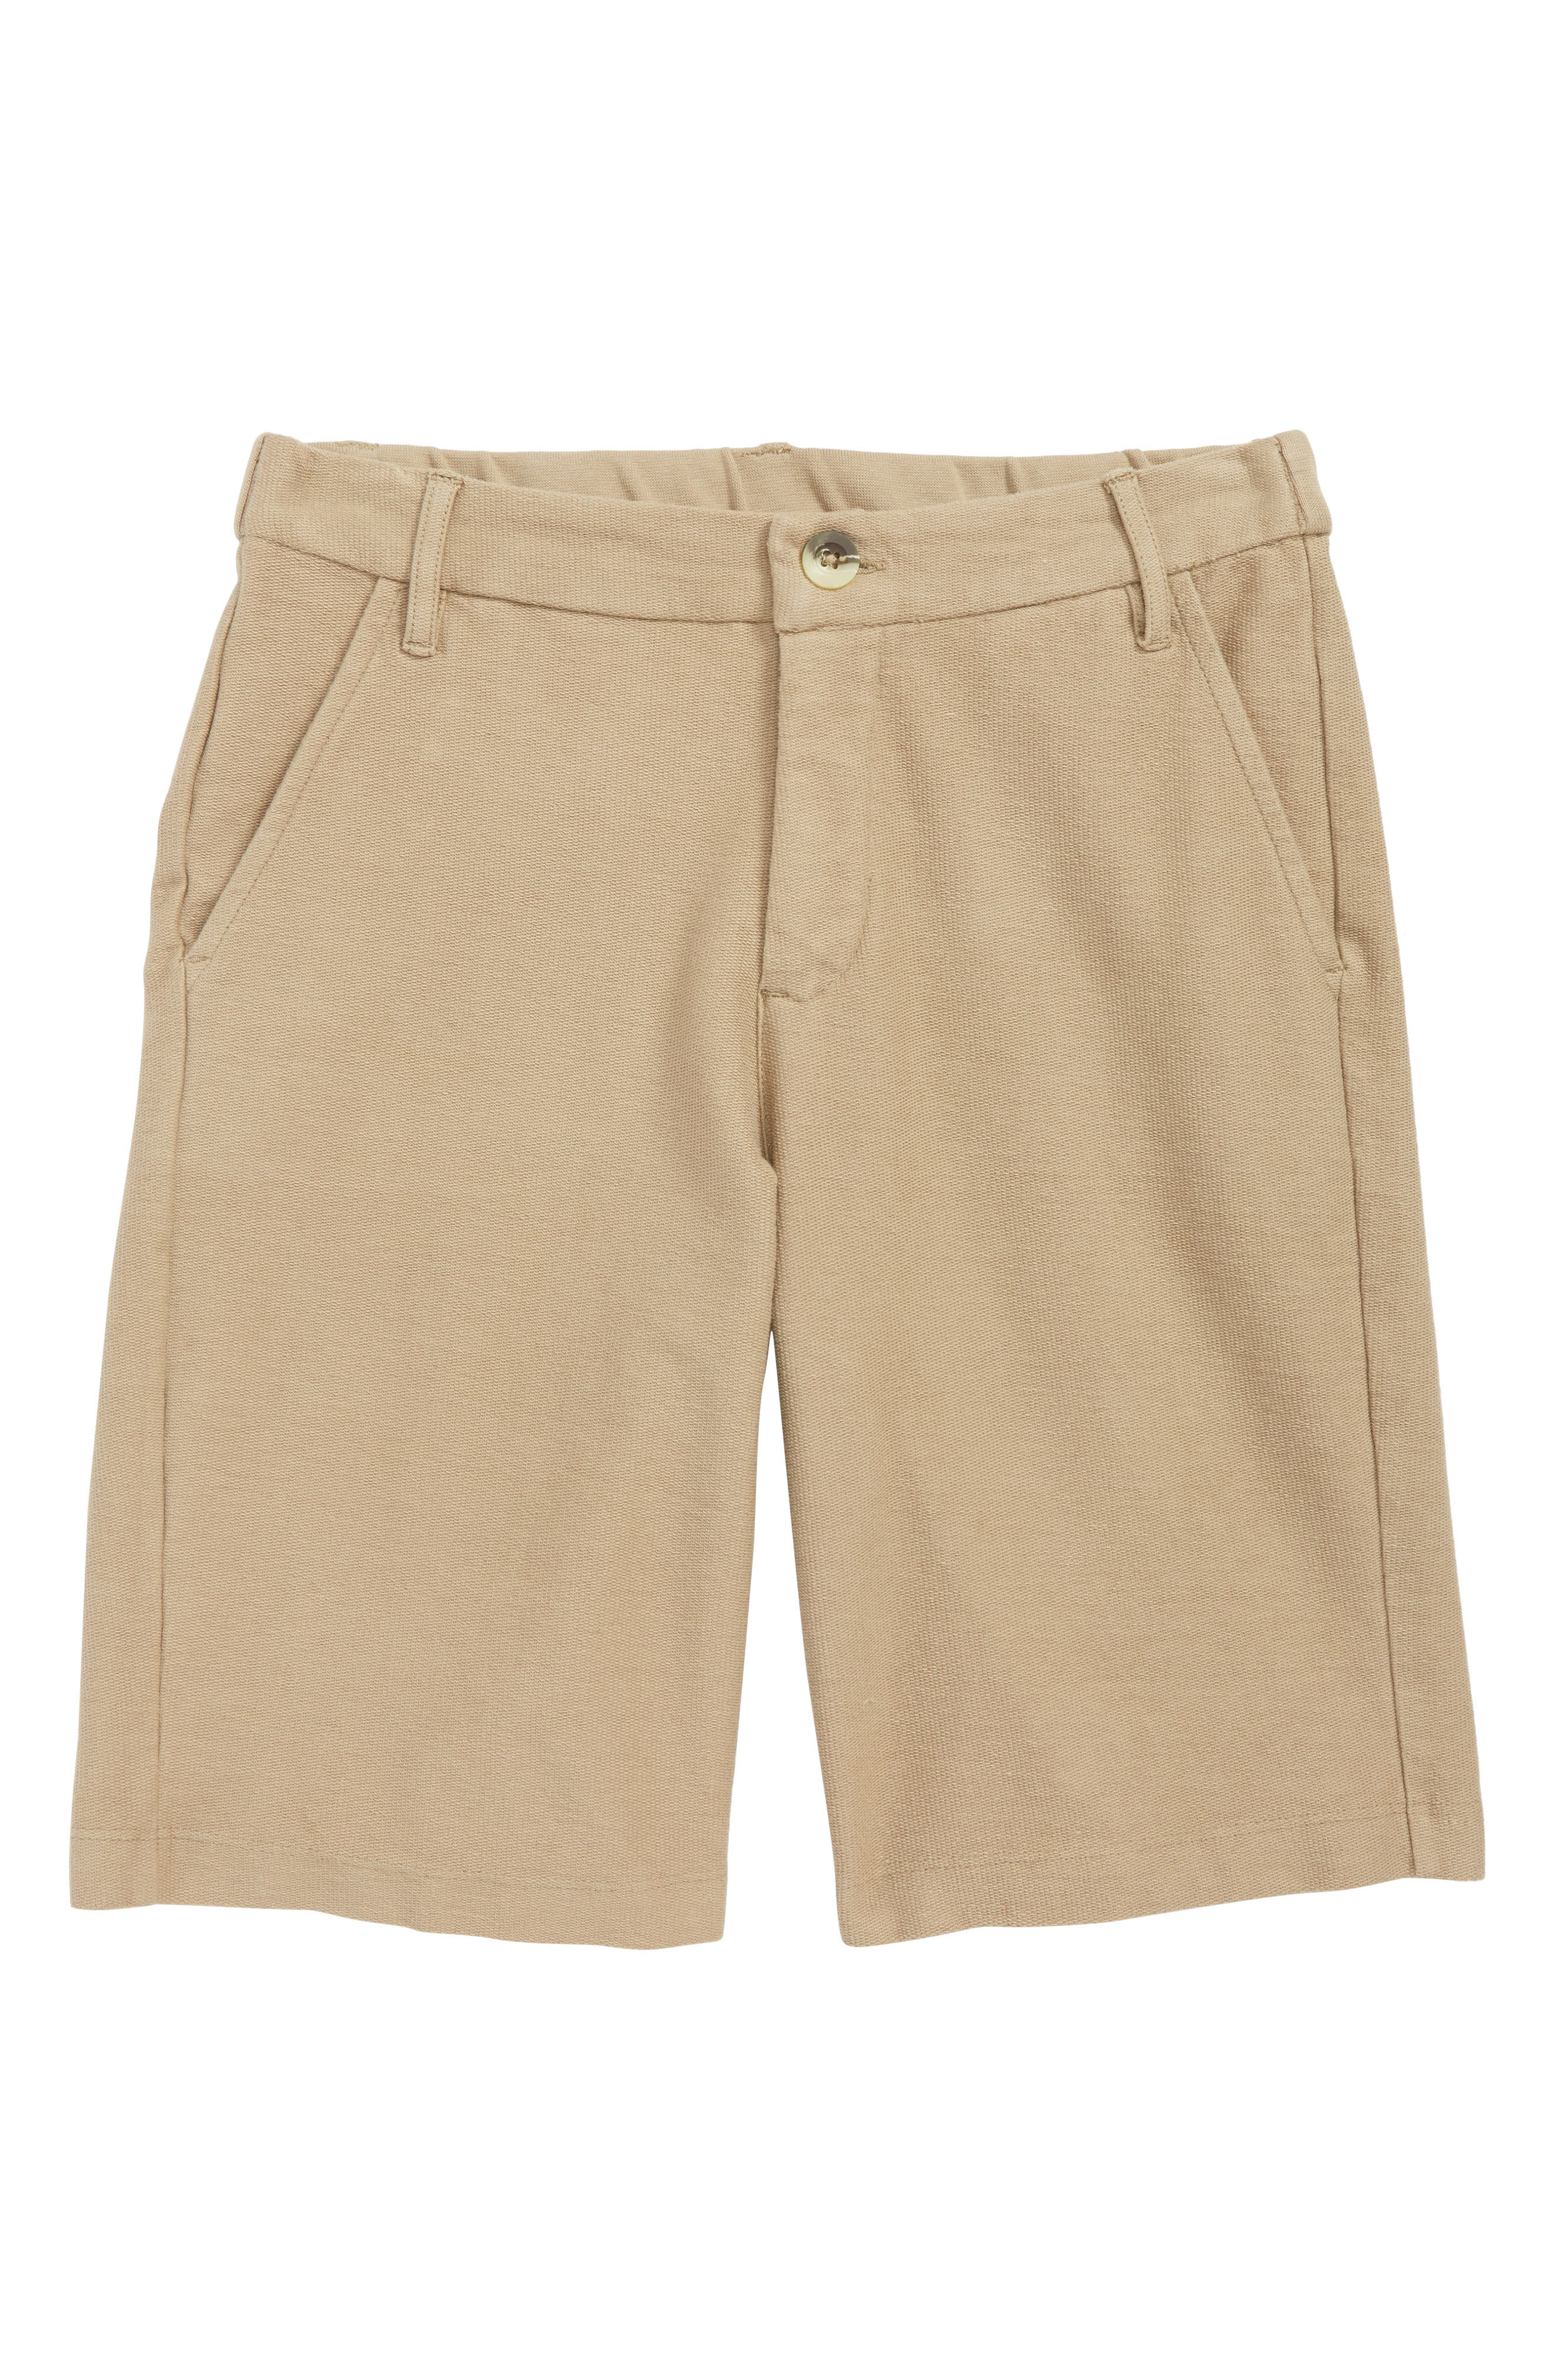 Easton Shorts,                             Main thumbnail 1, color,                             250